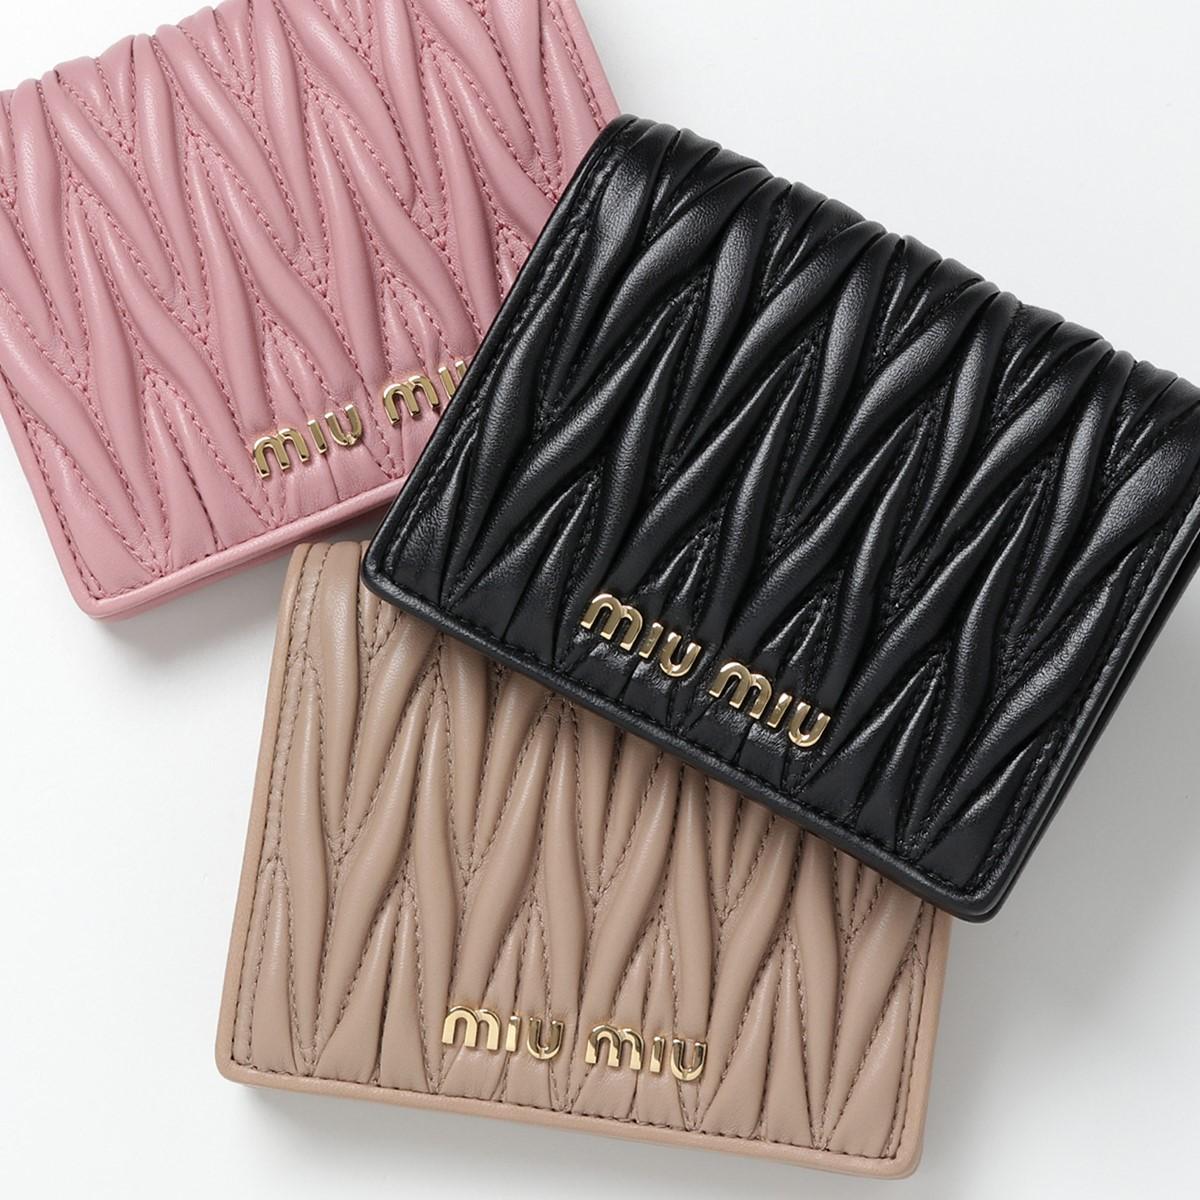 miumiu ミュウミュウ 5MV204 N88 F0002 MATELASSE マテラッセ キルティングレザー 二つ折り財布 スモール ミニ財布 豆財布 カラーNERO